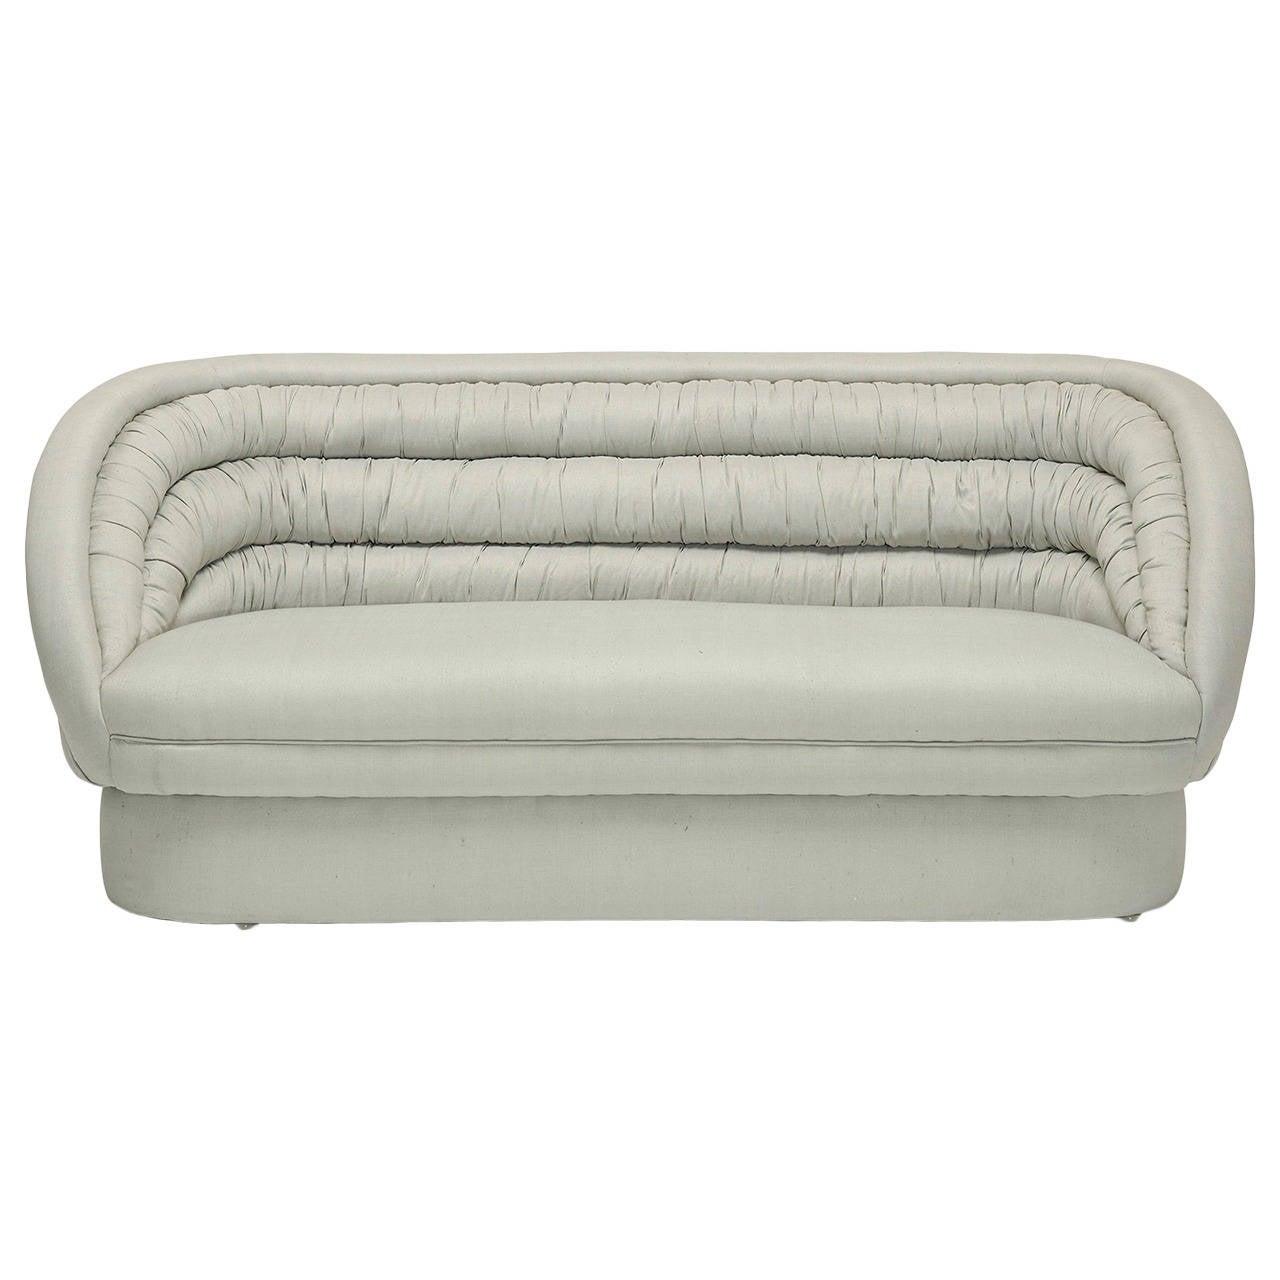 Crescent Sofa by Vladimir Kagan for Vladimir Kagan Designs